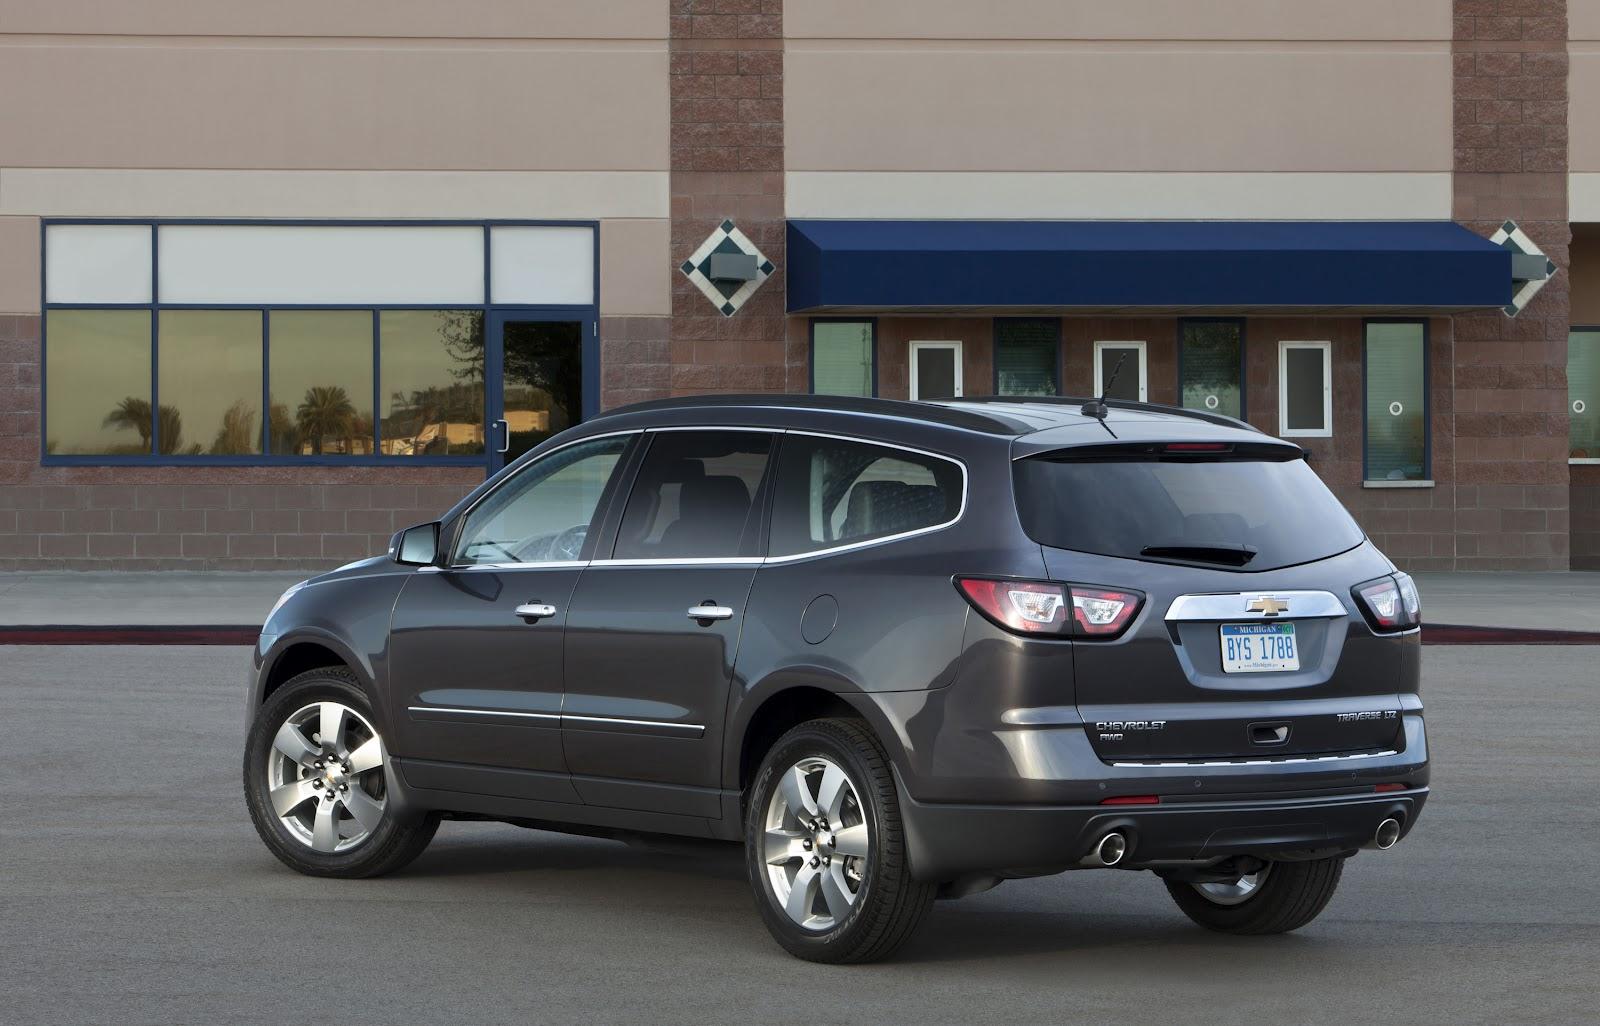 chevrolet - 2009 - [Chevrolet] traverse 2013+chevrolet+traverse+7